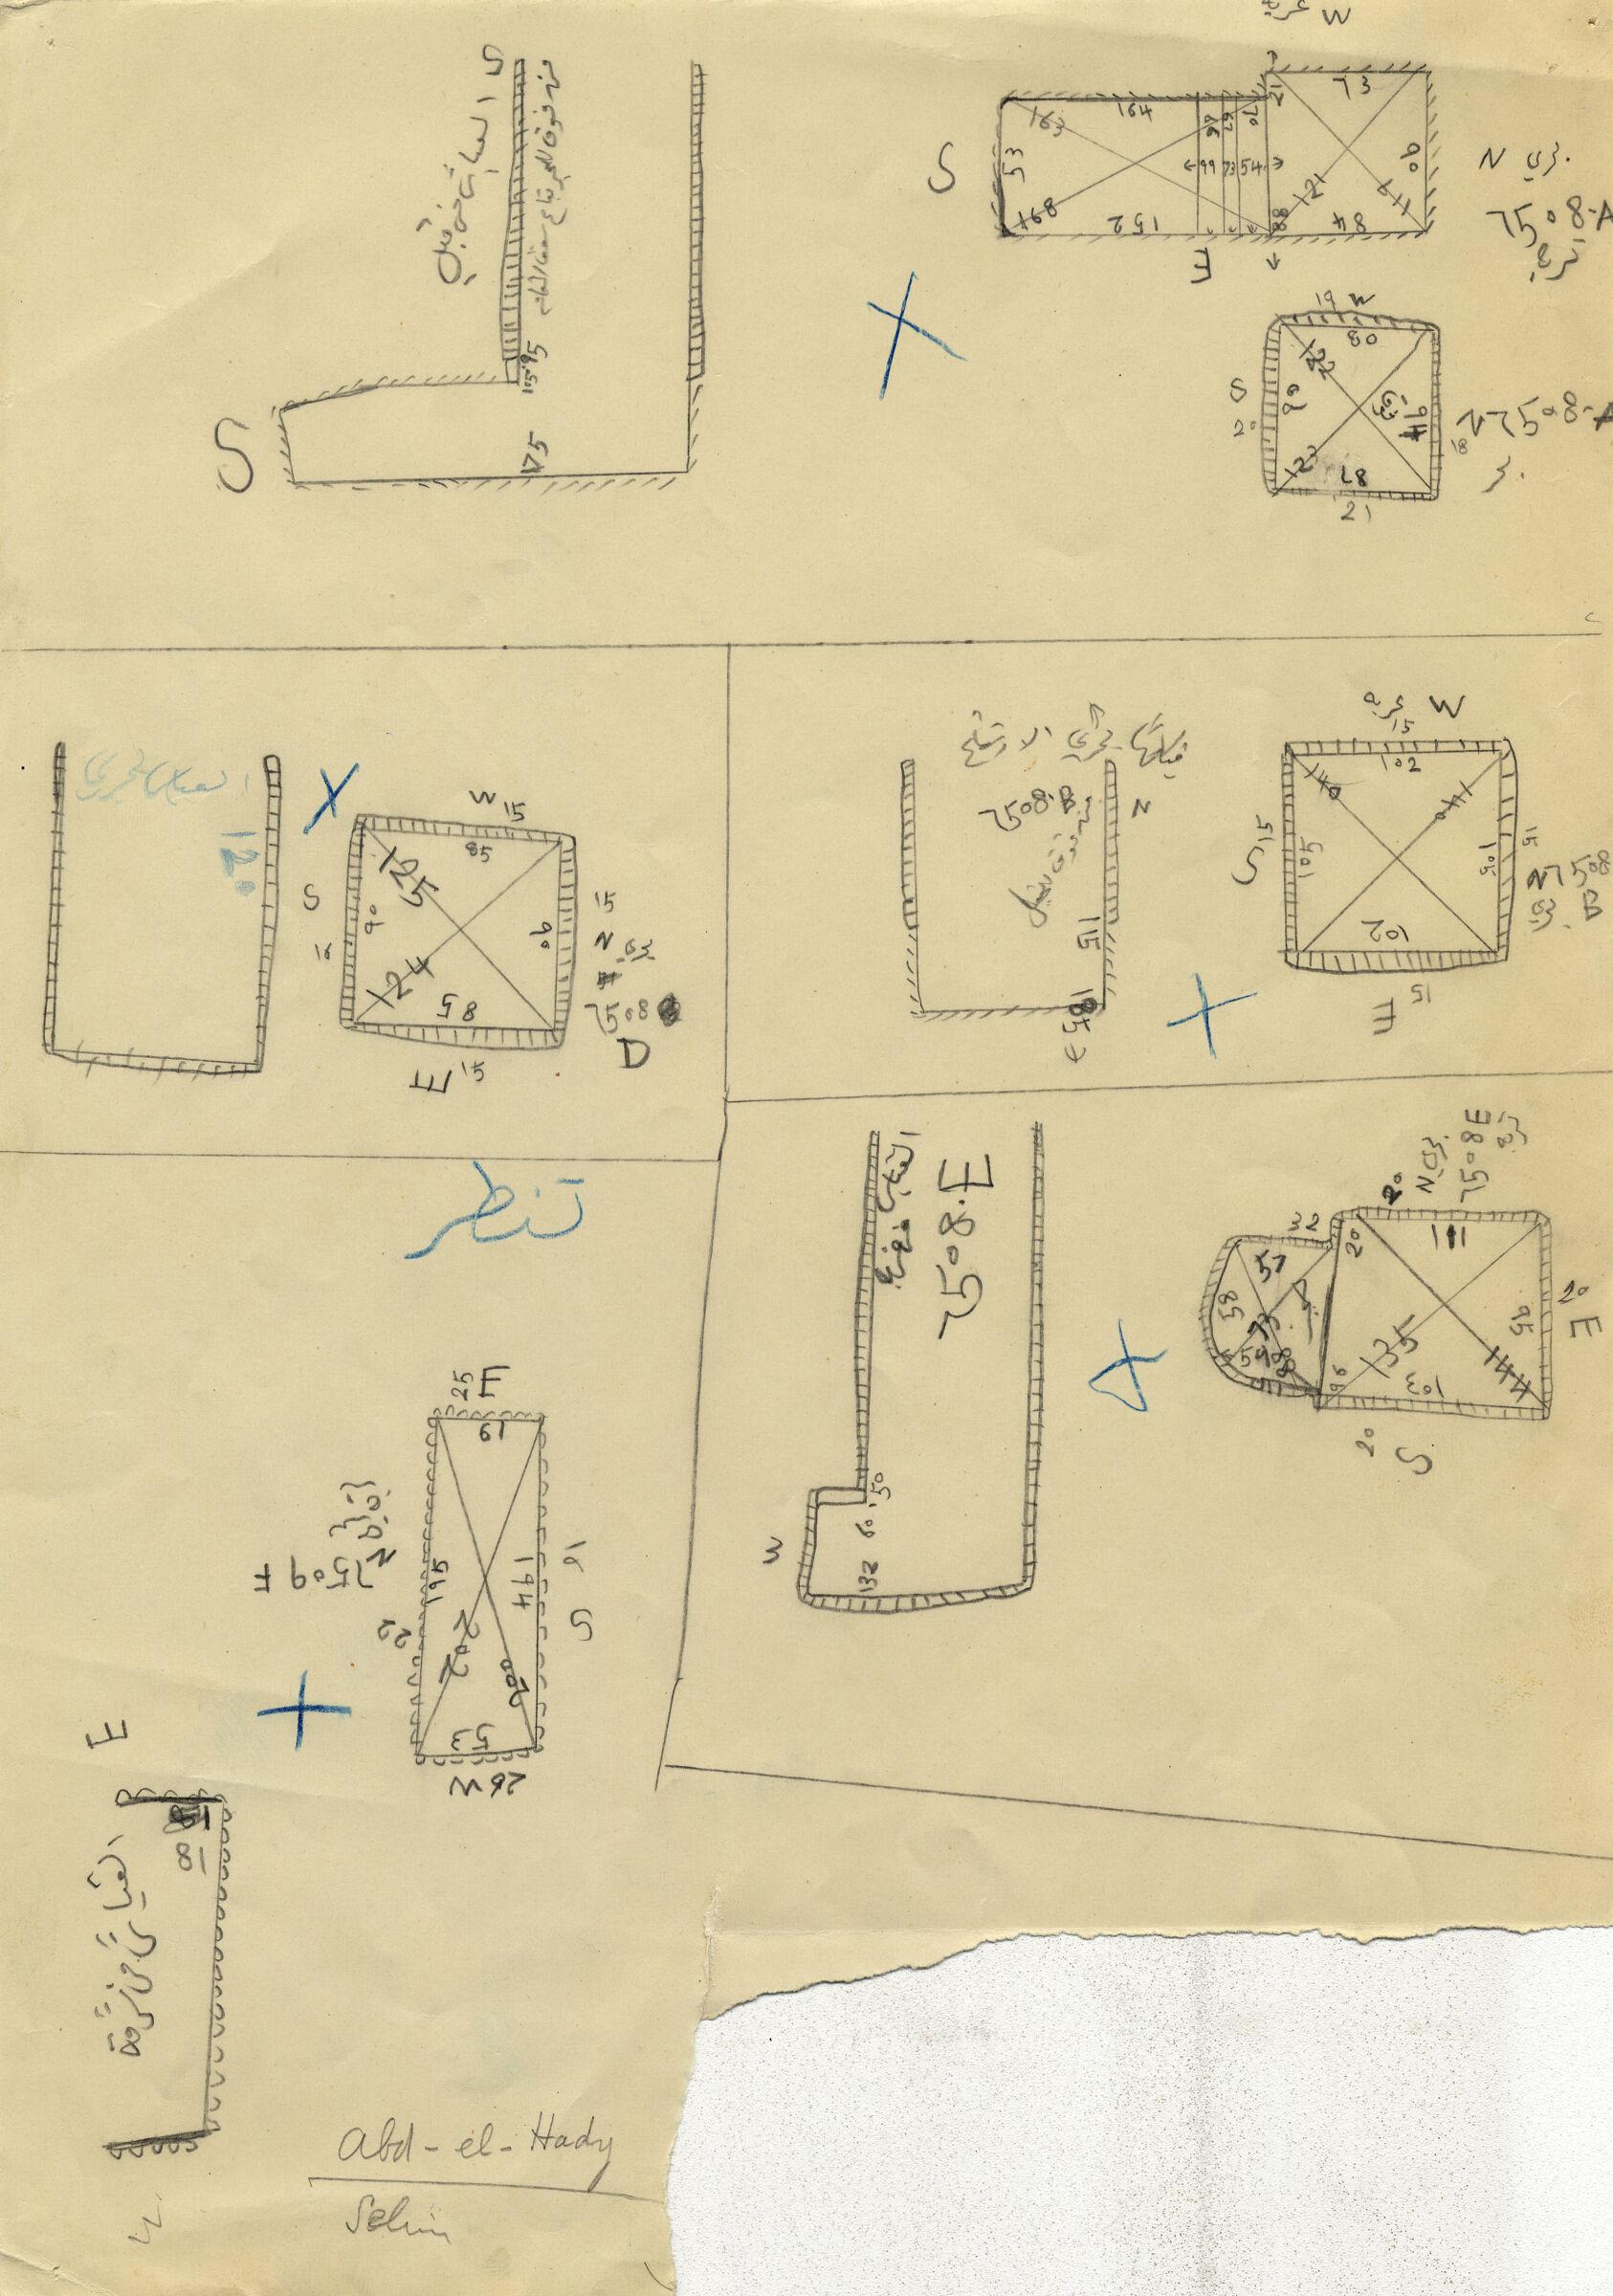 Maps and plans: G 7508, Shaft A, B, D, E & G 7509, Shaft F